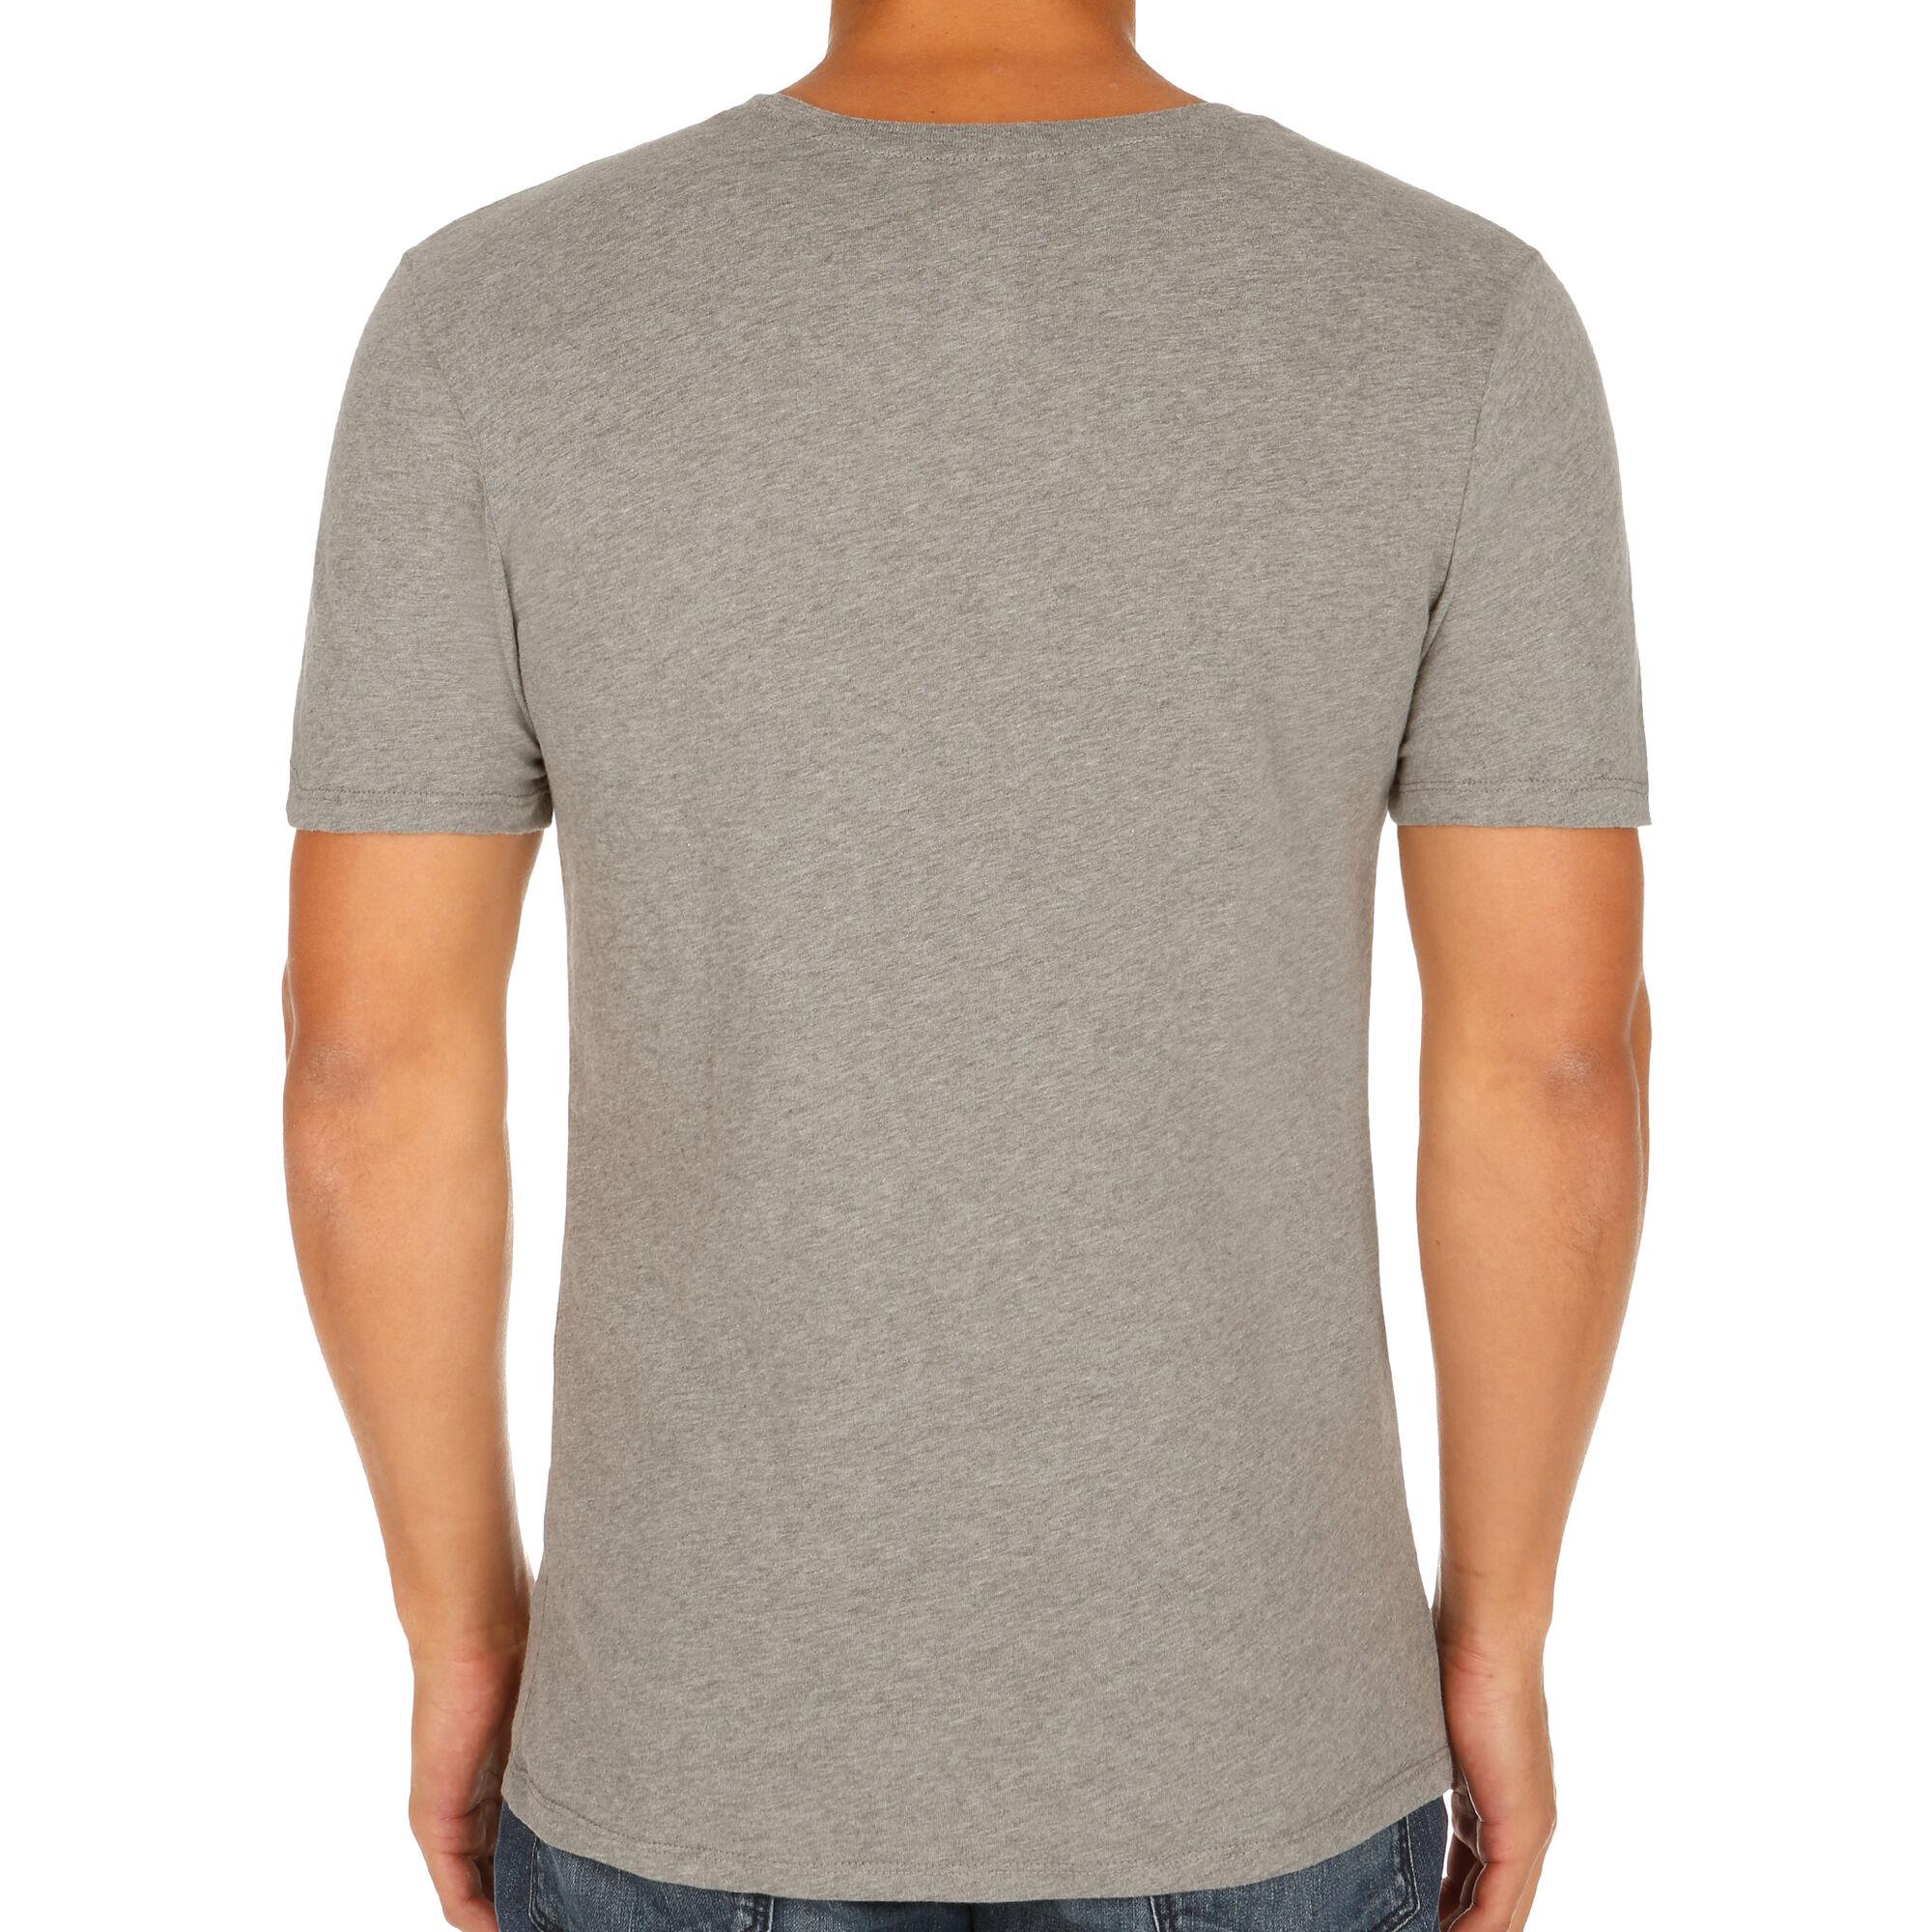 innovative design 20684 8f7f3 Nike Sportswear Futura Icon T-Shirt Herren - Hellgrau, Blau online ...